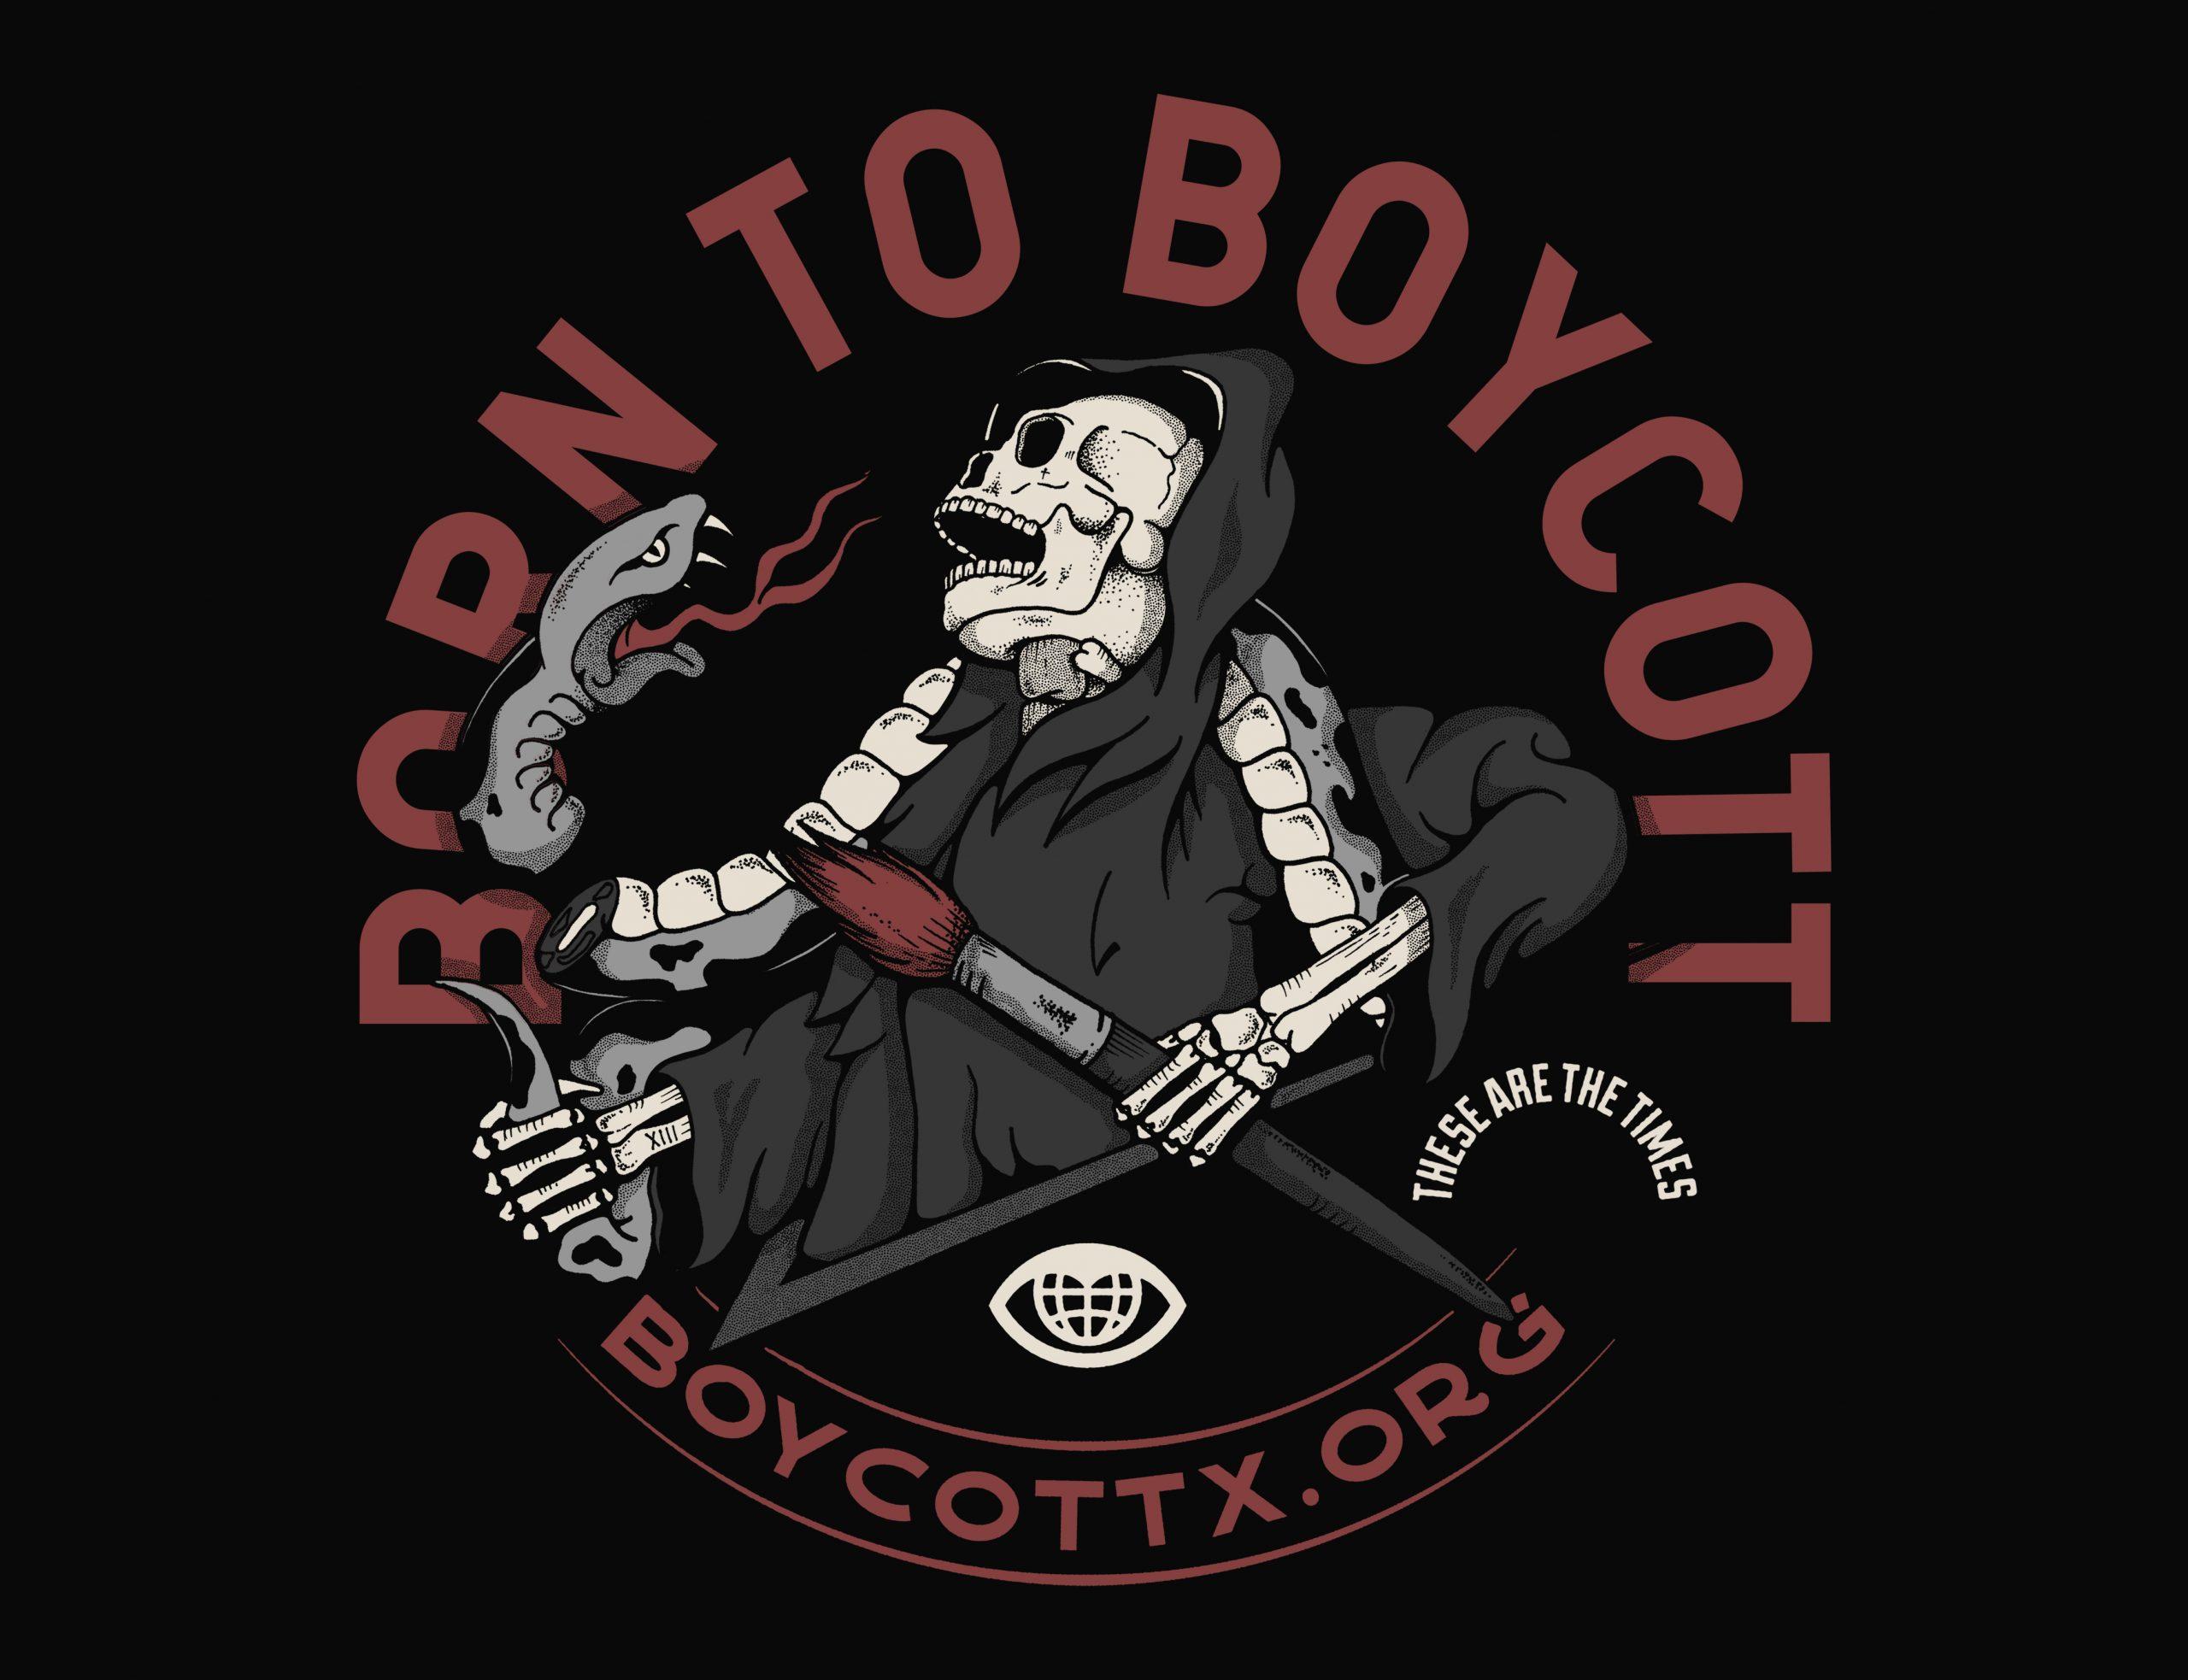 THE BIRTH OF BOYCOTT